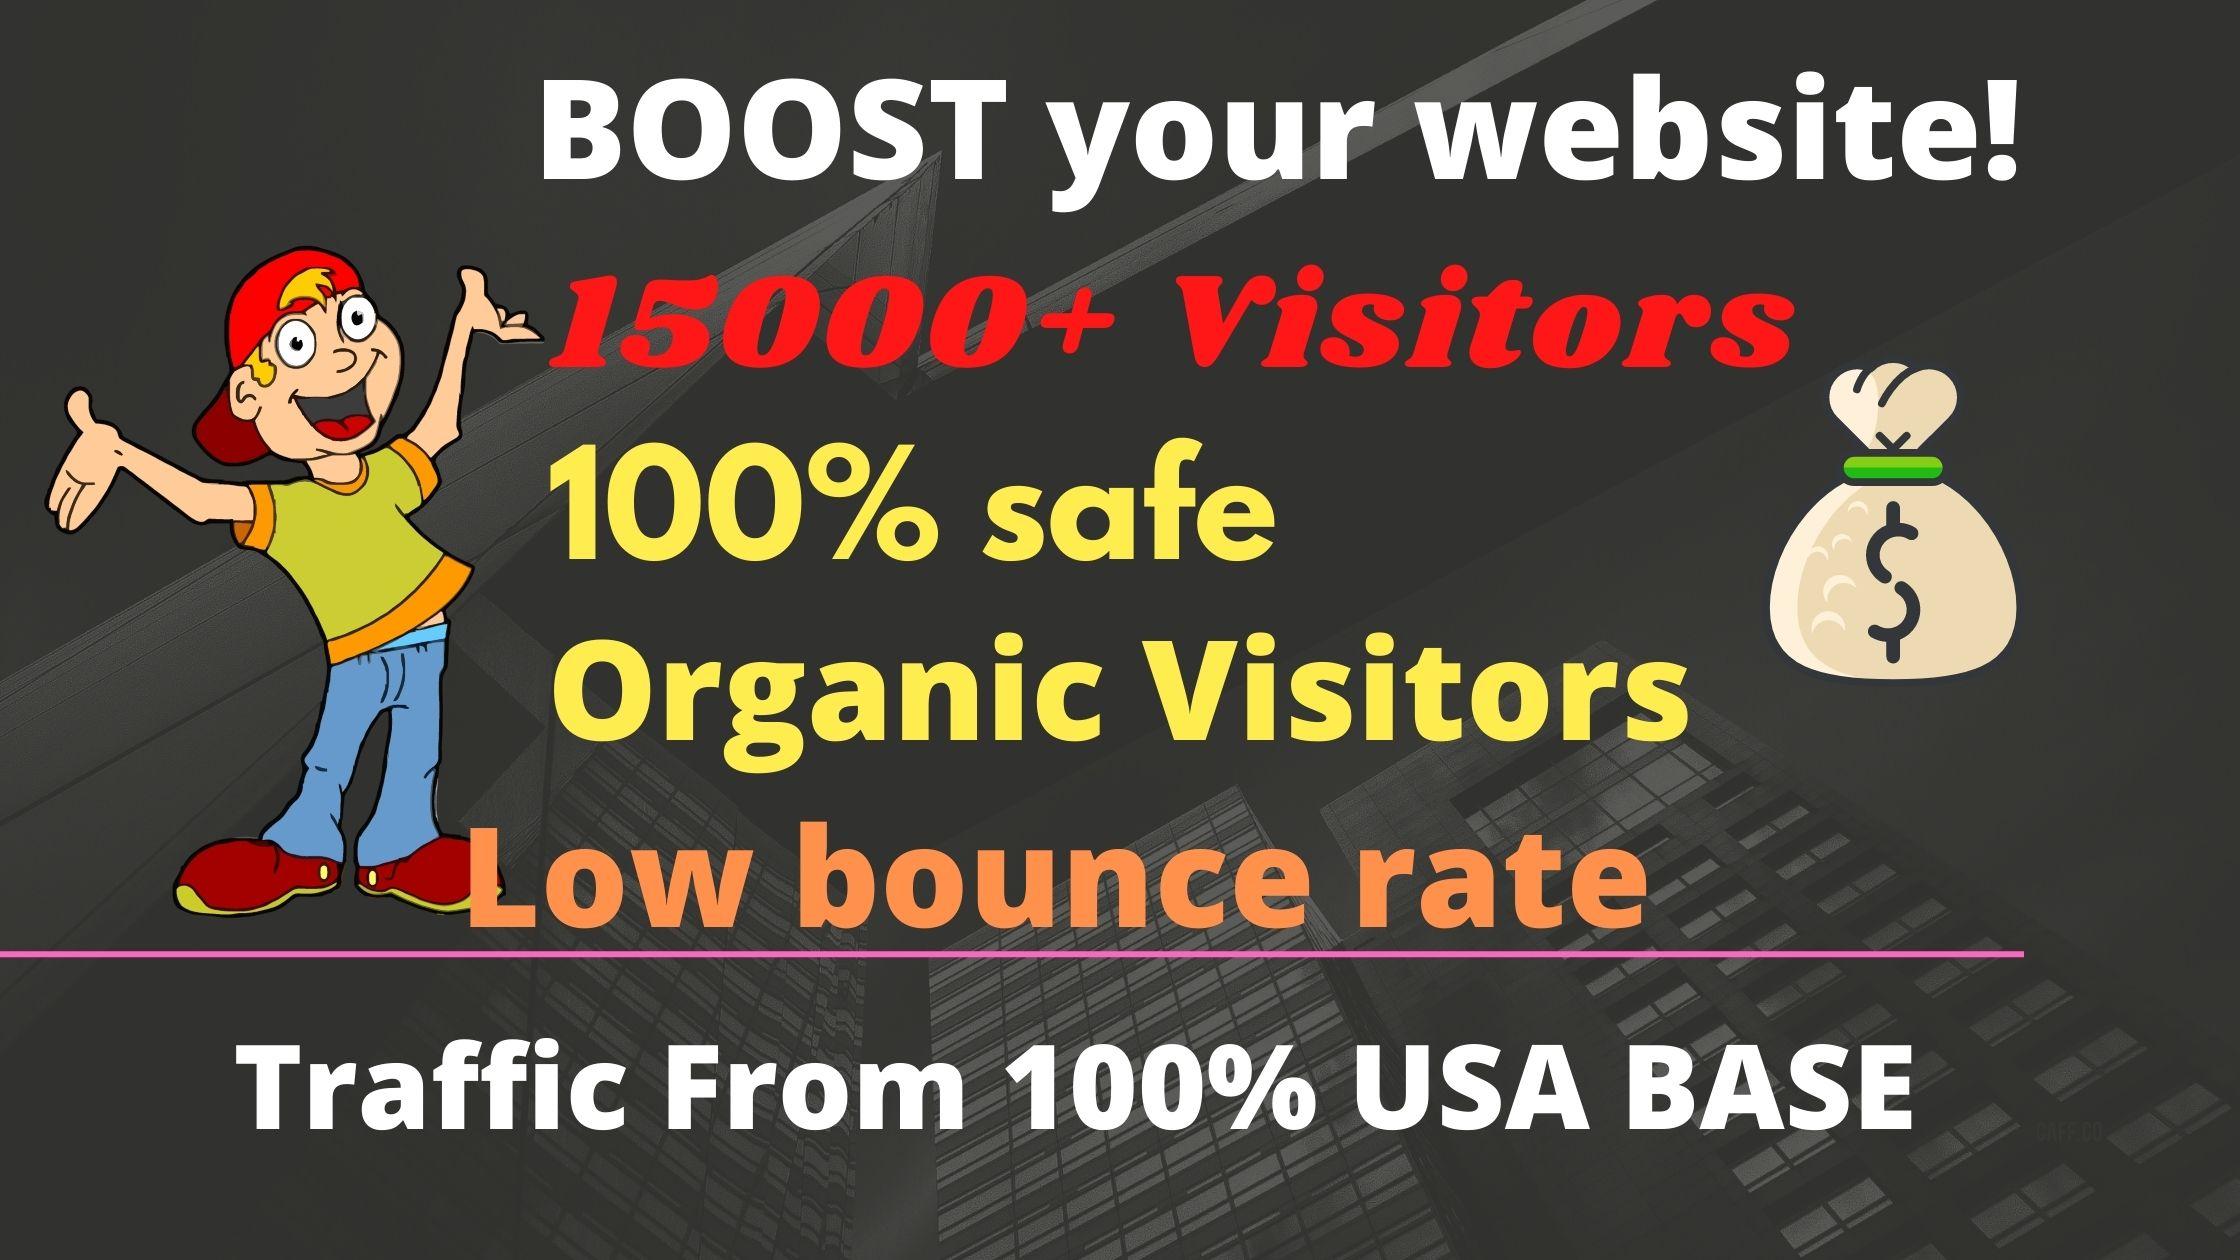 15000plus drive keyword targeted USA organic web traffic